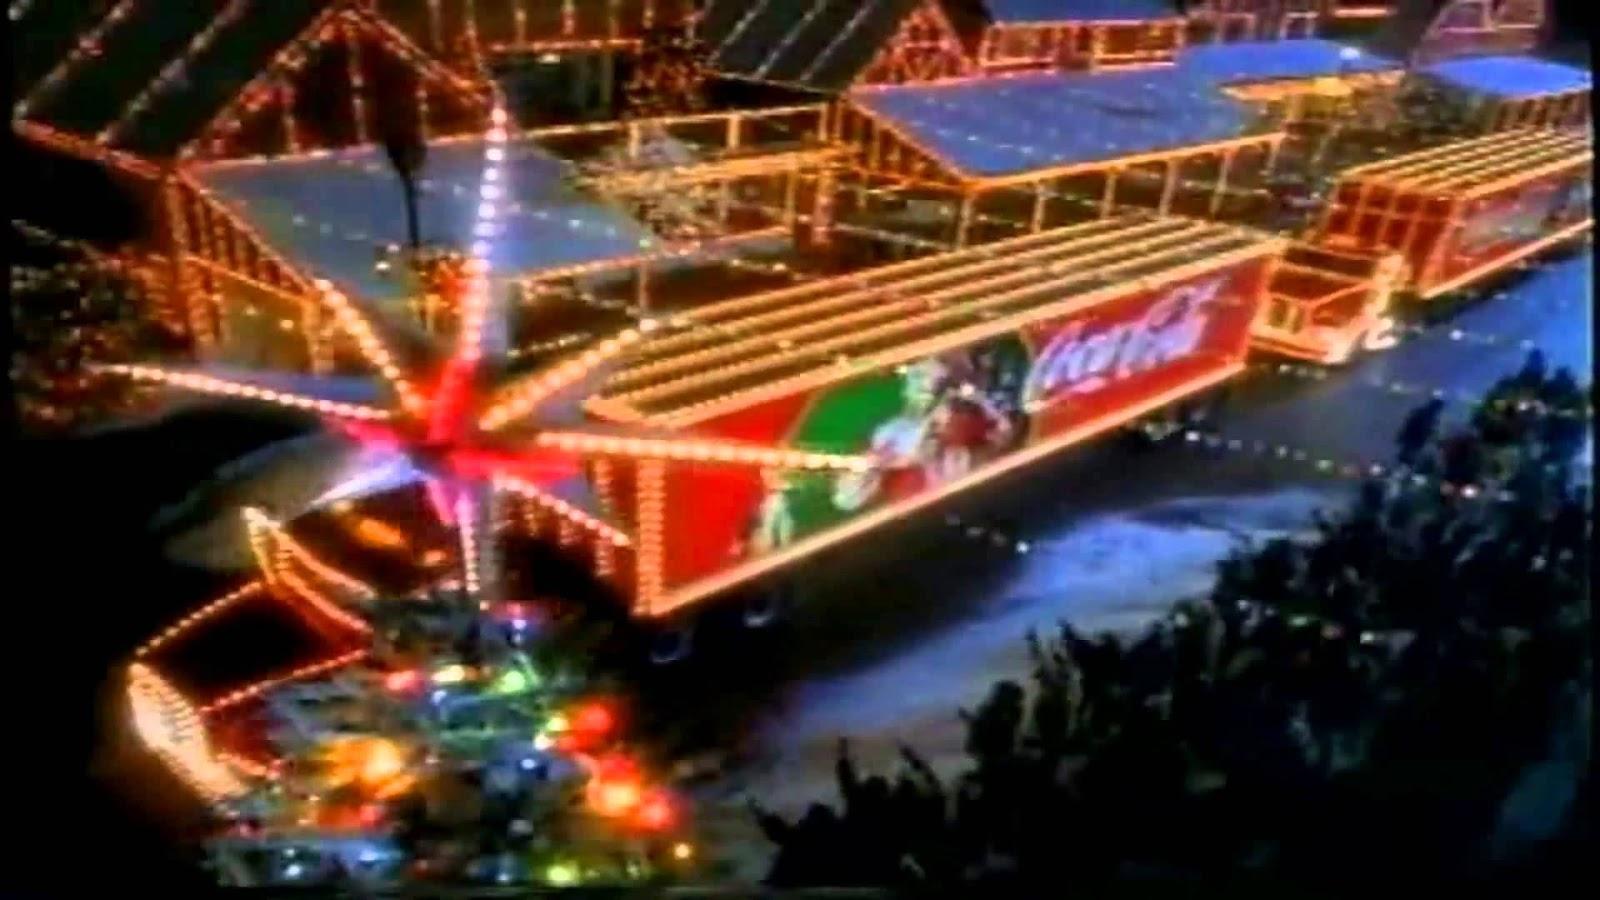 coca cola christmas commercial - Coca Cola Christmas Commercial